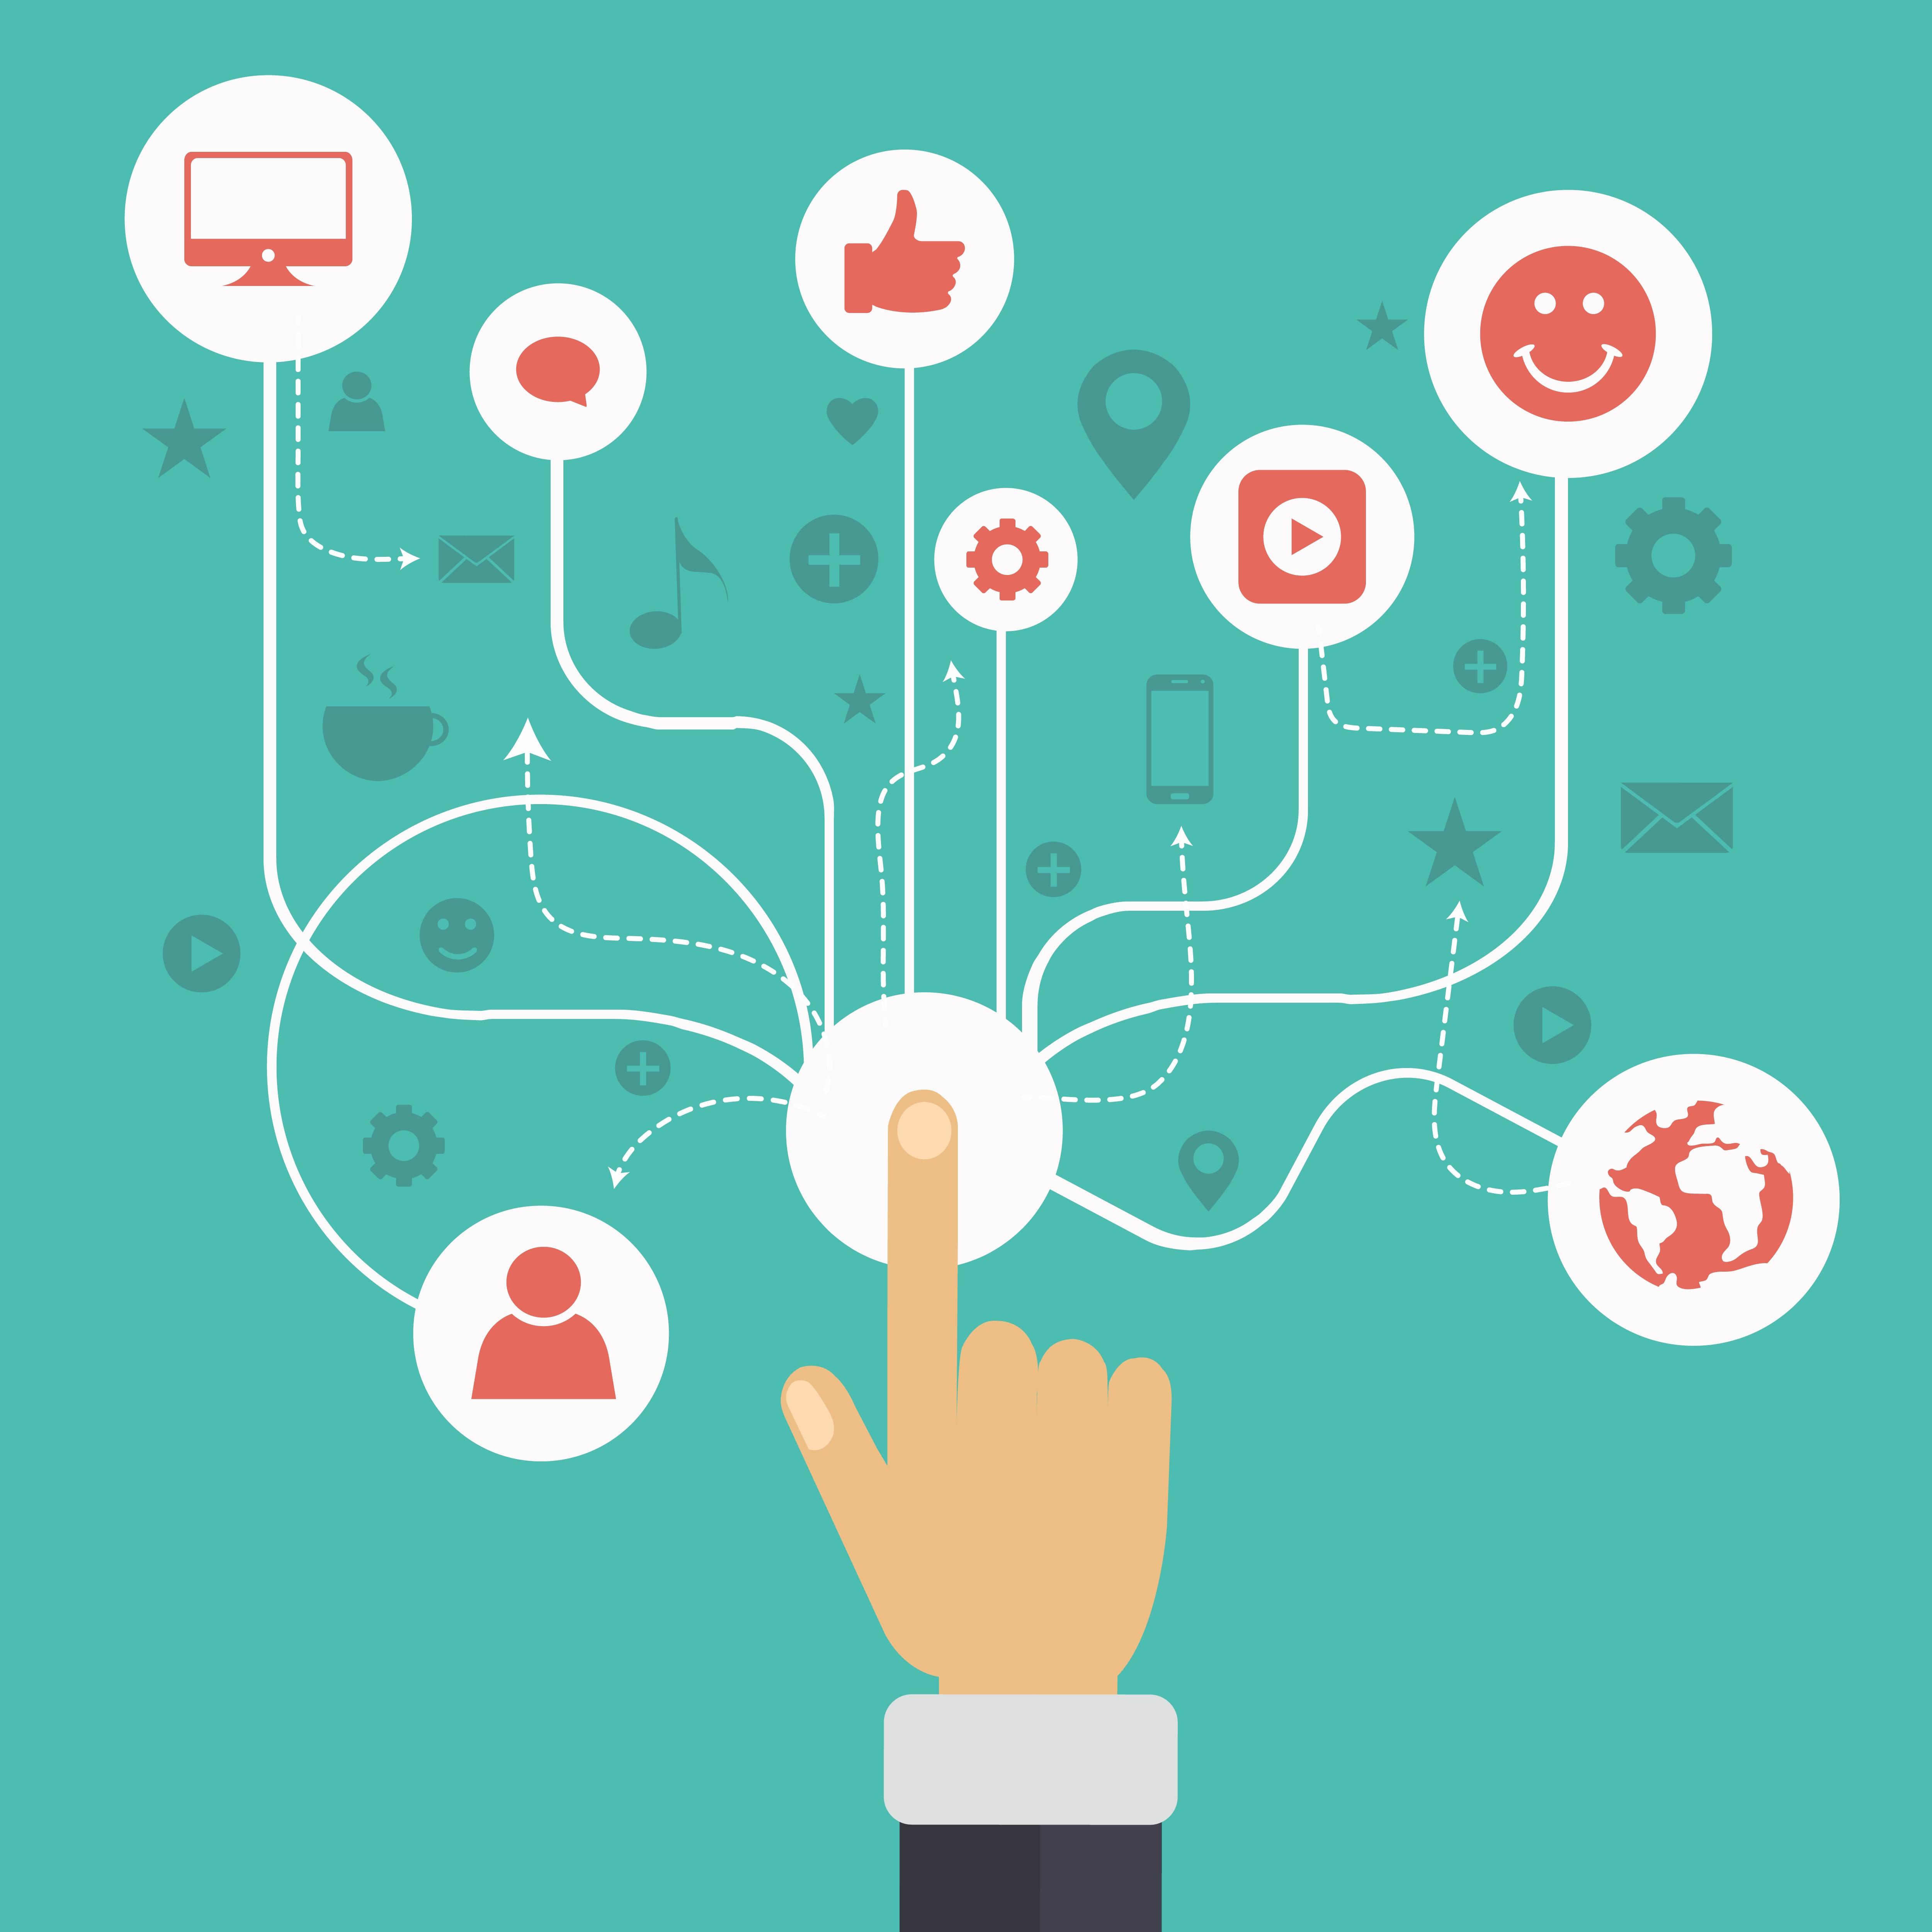 Digital communication channels